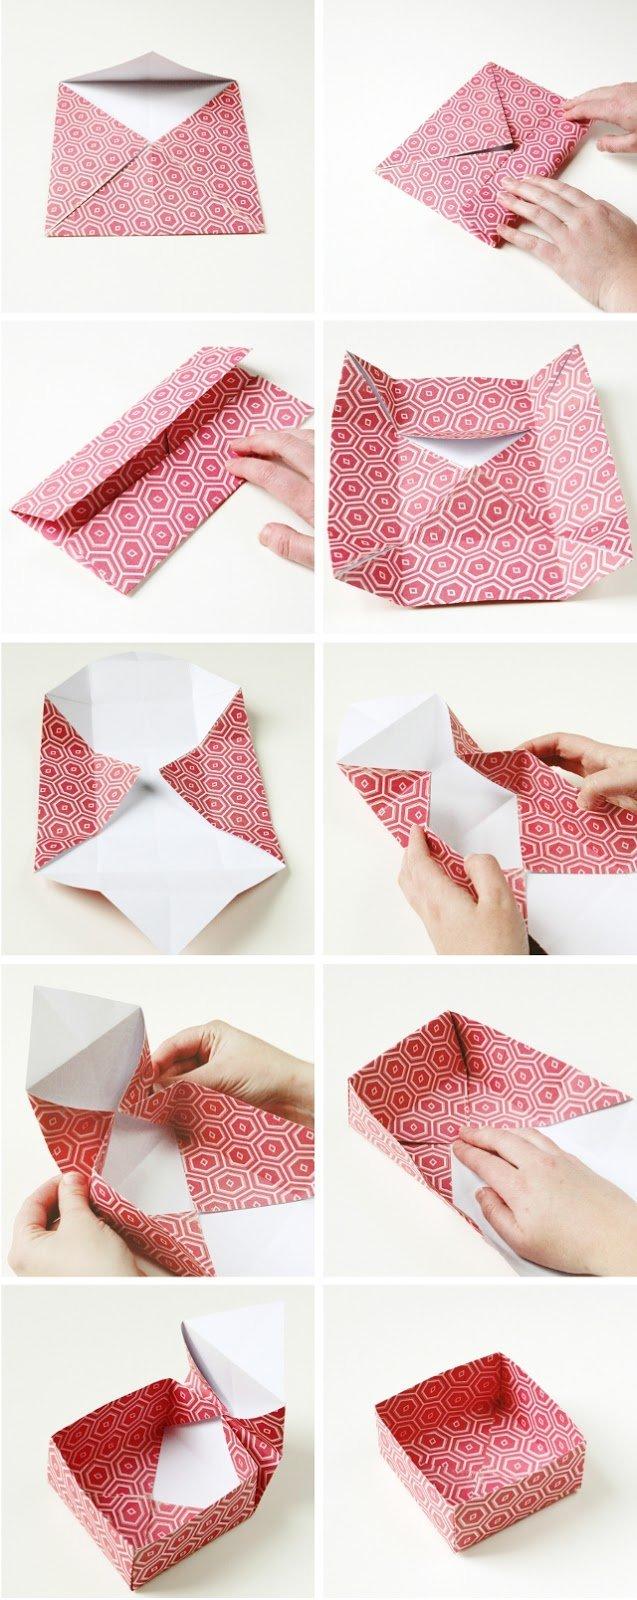 Geschenkverpackung basteln aus Geschenkpapier - DIY Anleitung